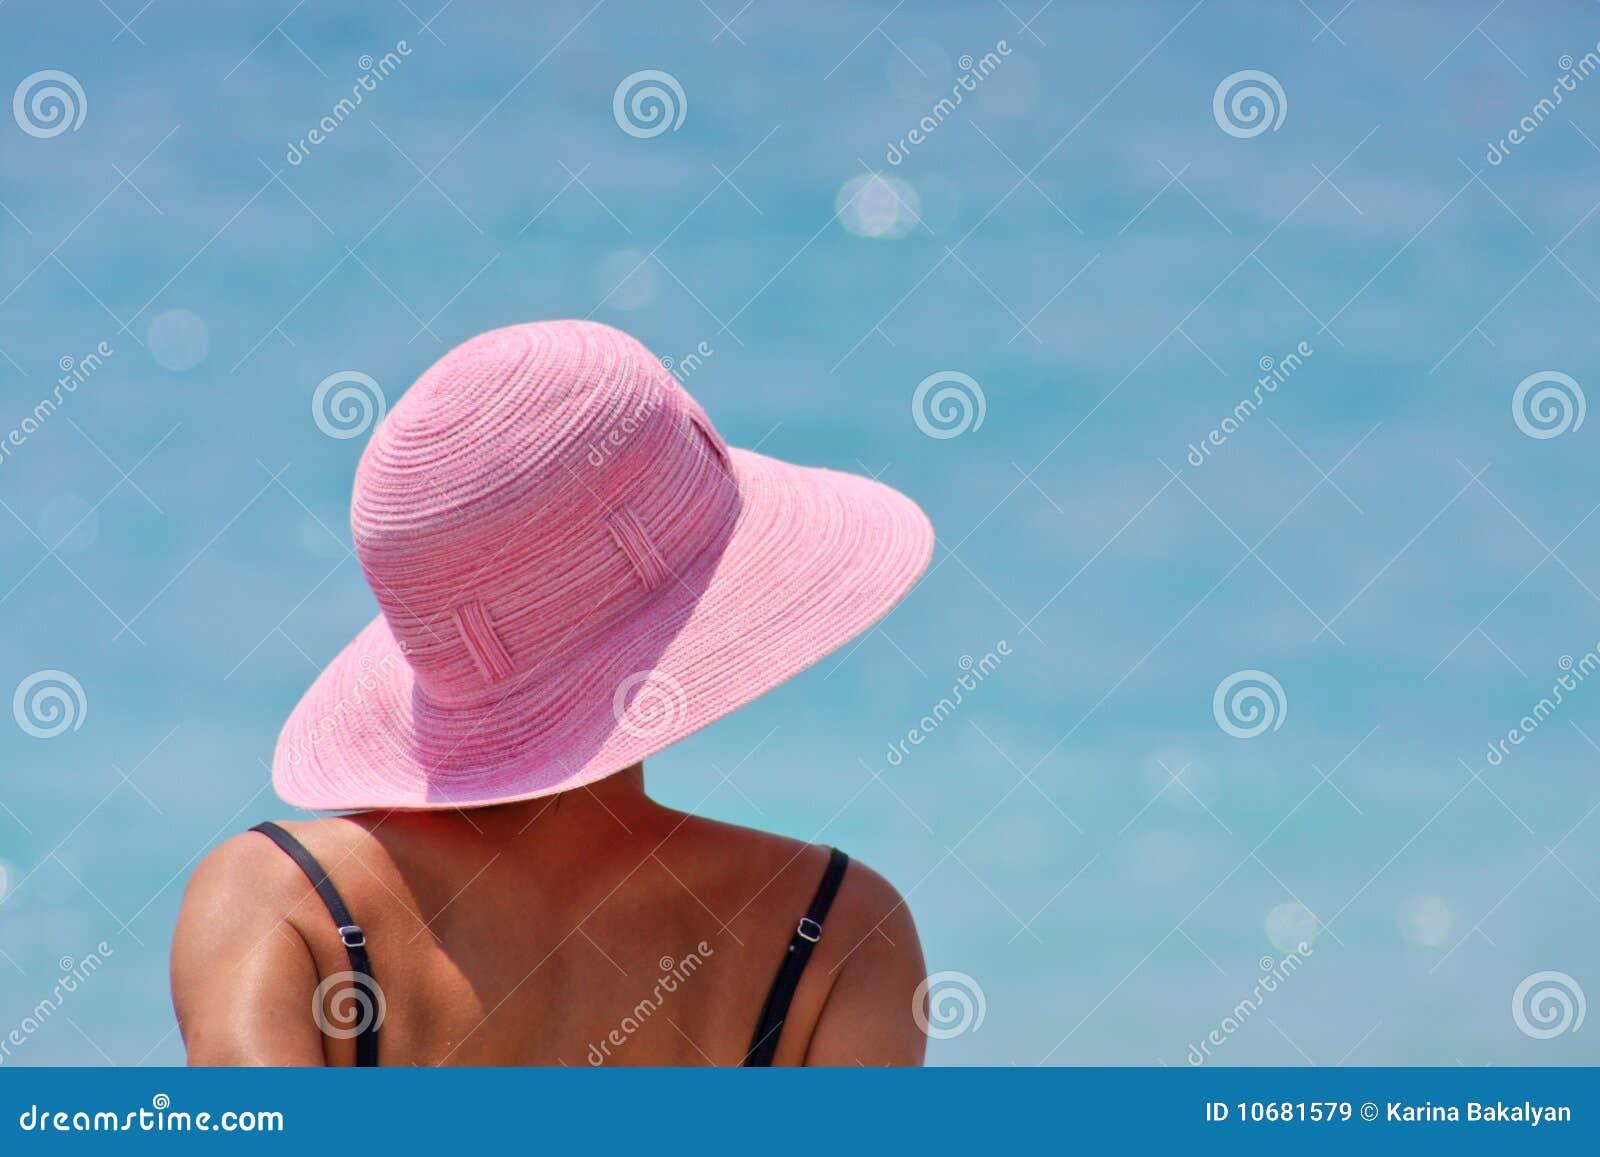 Bajo mi sombrero imagen de archivo. Imagen de modelo - 10681579 c9b977abc85